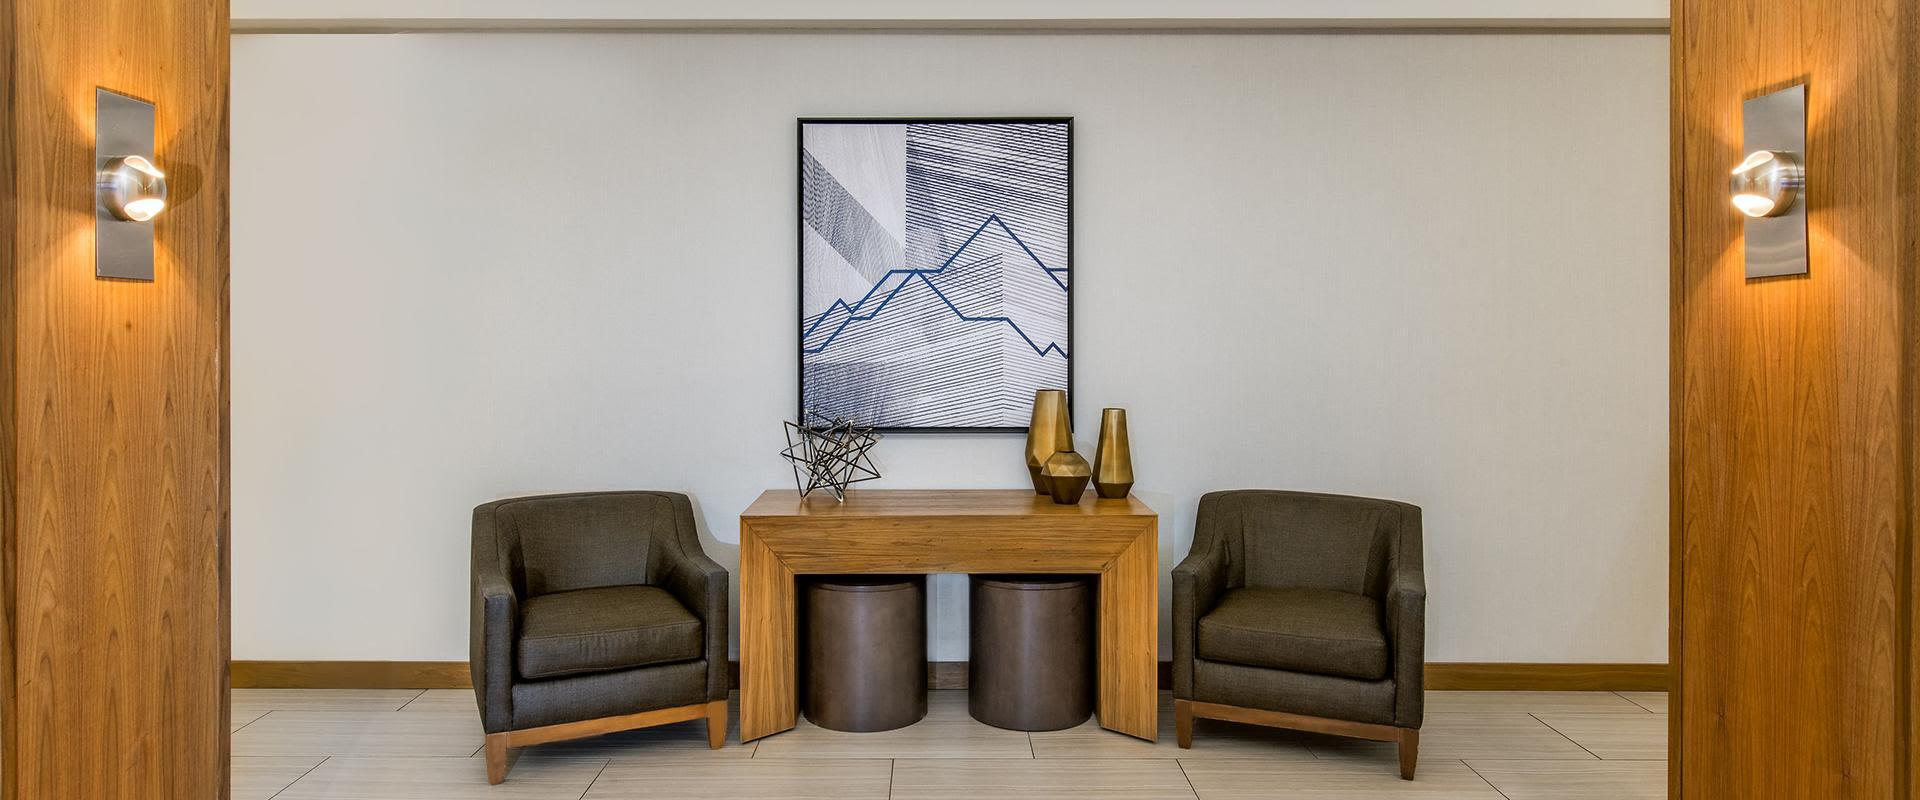 Denver Lobby Area Chairs